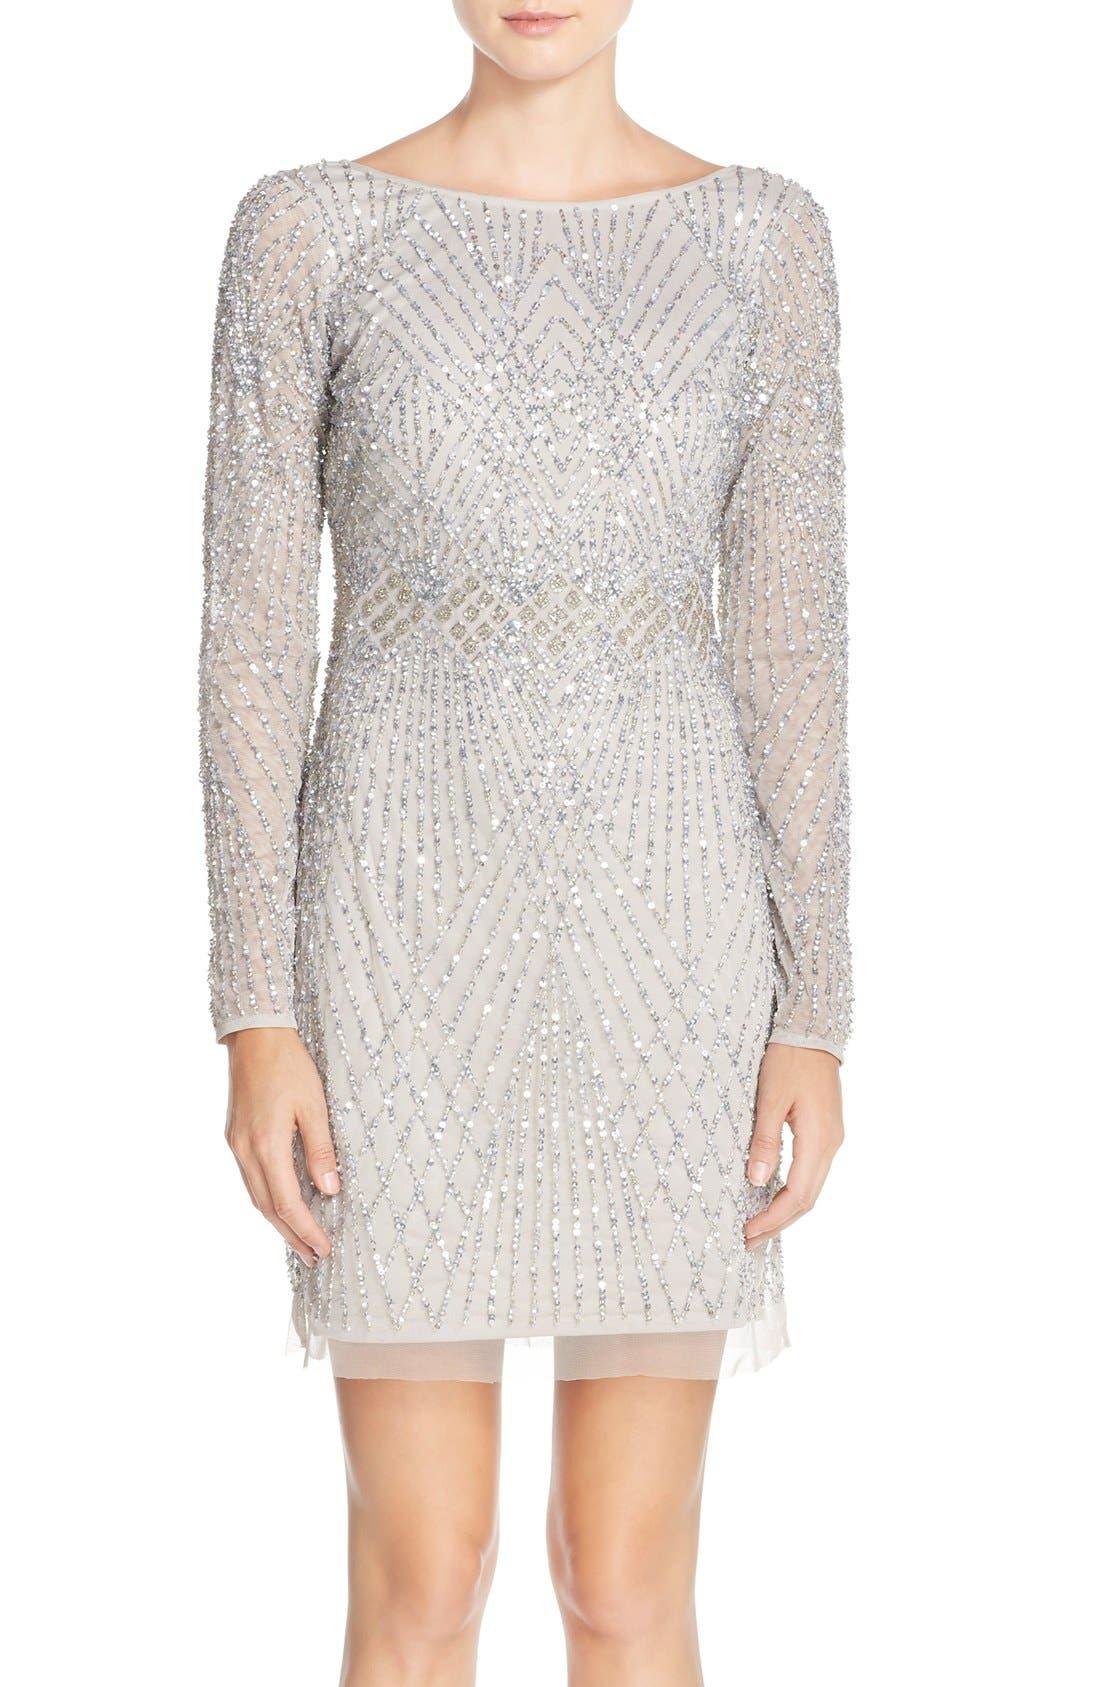 Alternate Image 1 Selected - Aidan Mattox Embellished Mesh Sheath Dress